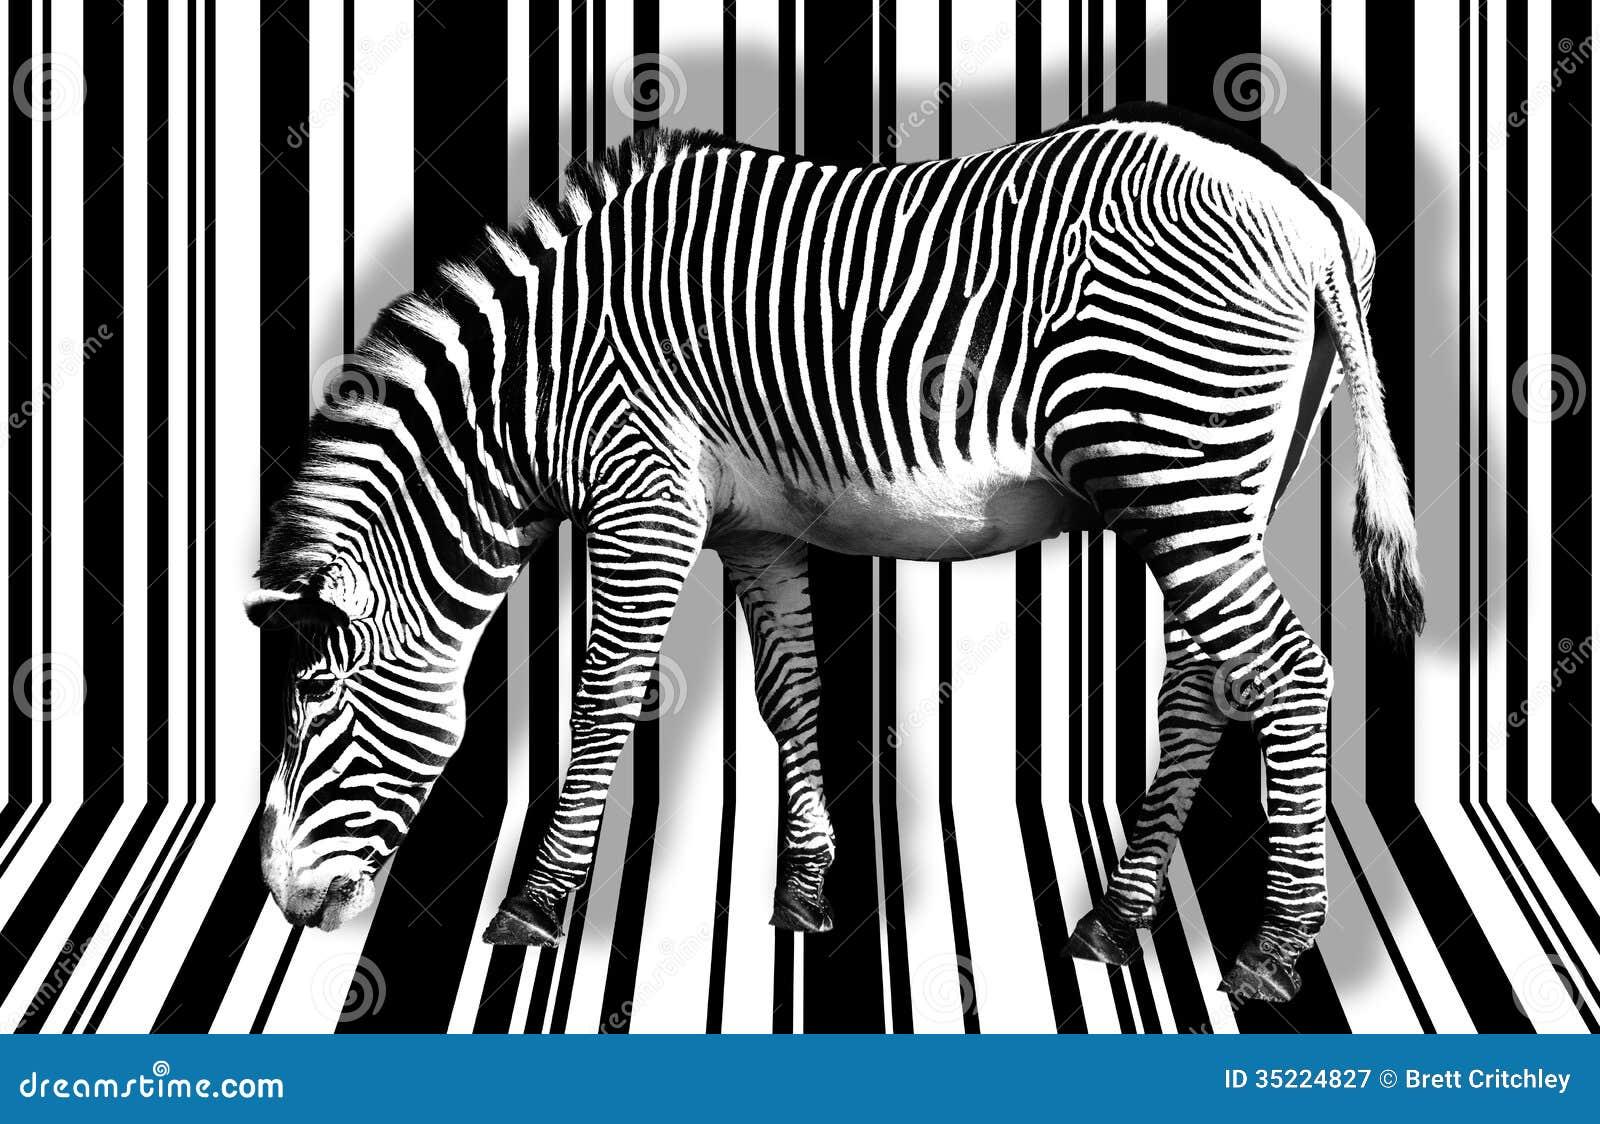 Zebra surreal